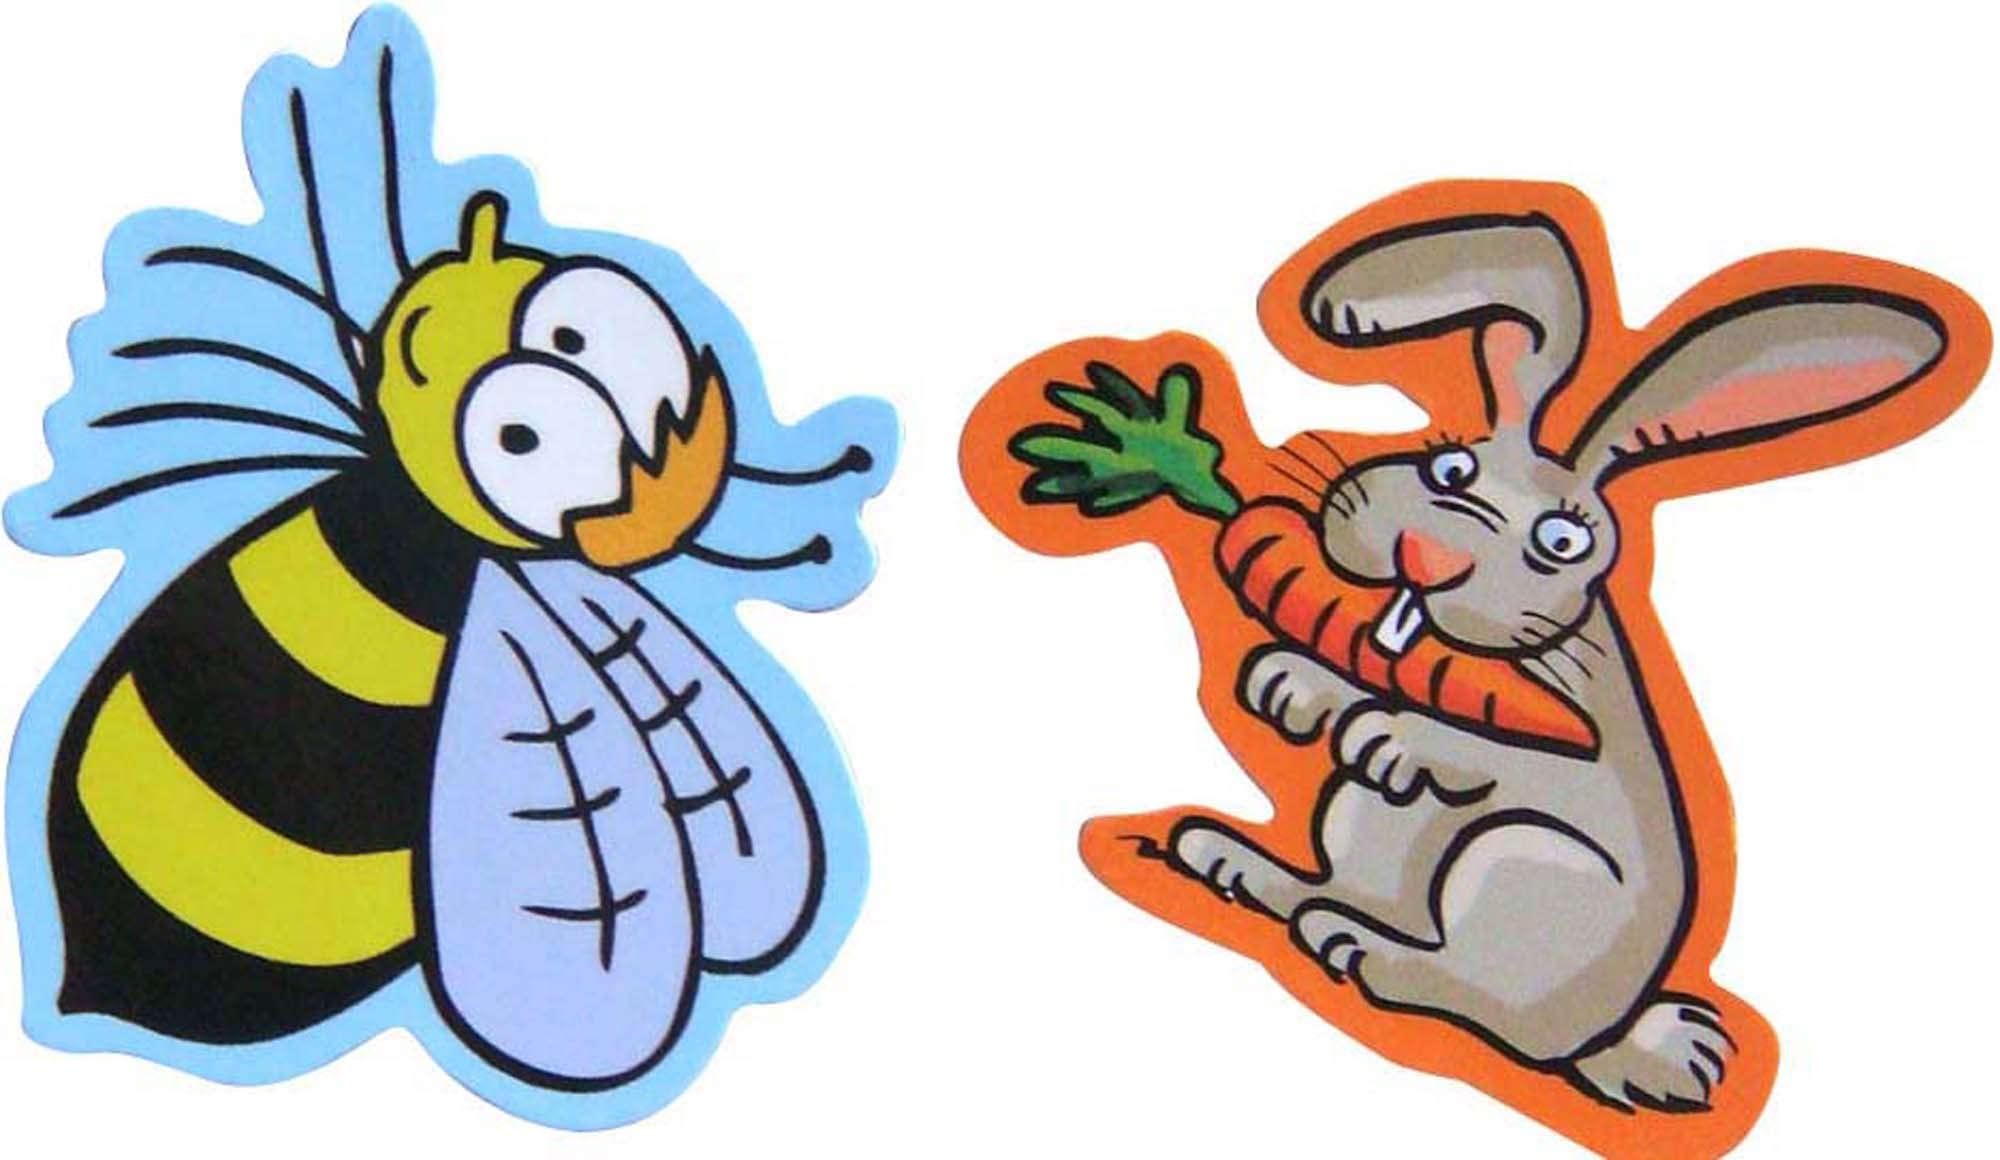 Sticker Printing Uk Custom Stickers Online Beeprinting